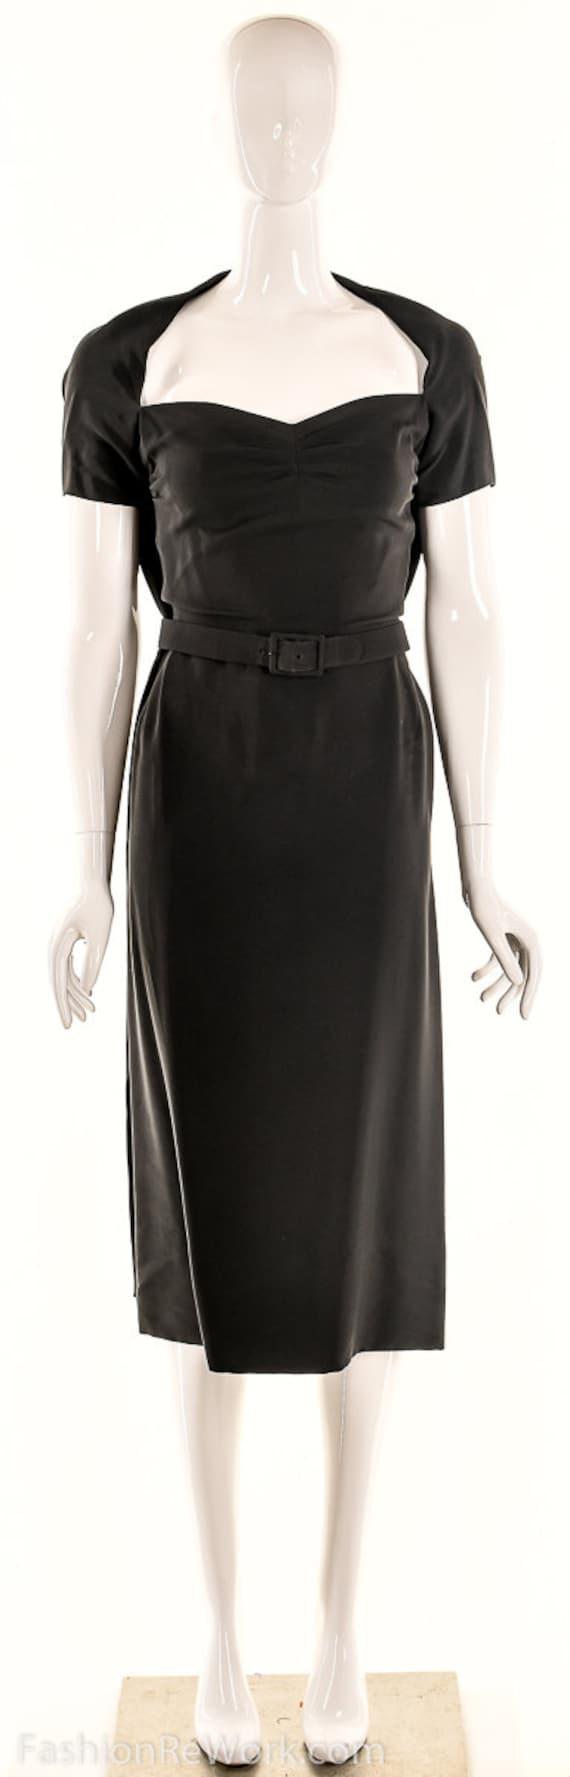 Vintage 40s Black Pencil Dress,40s Va Va Voom Dre… - image 9